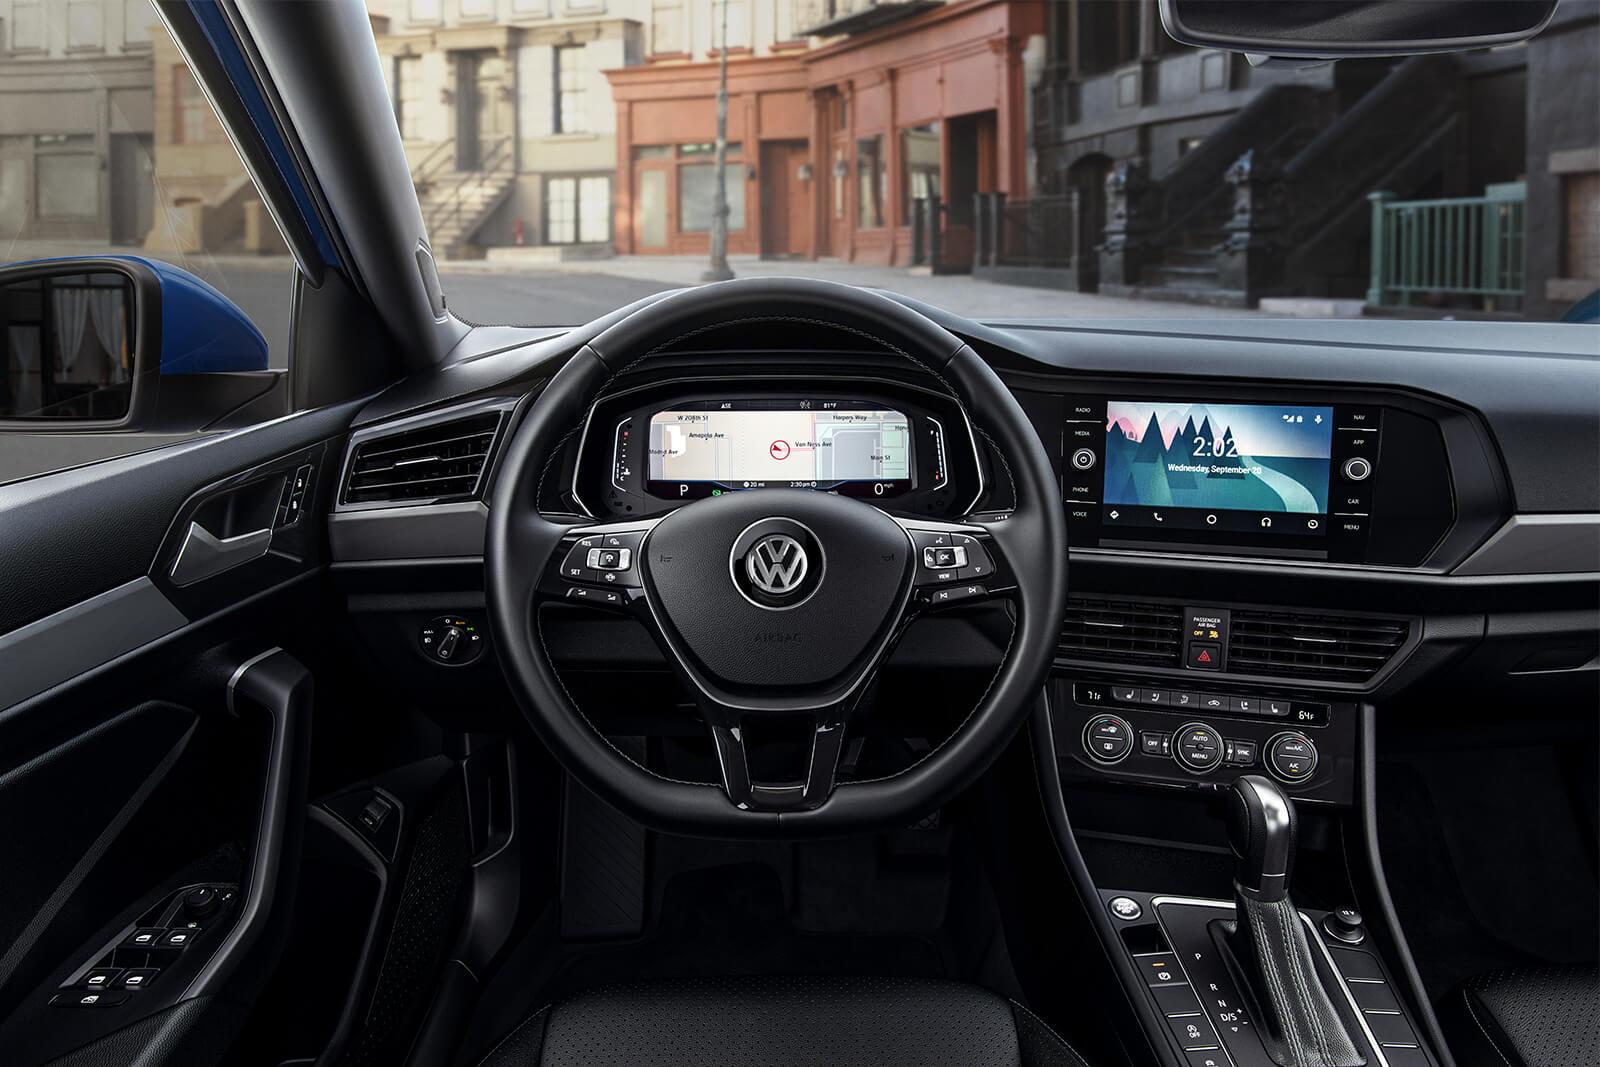 2019 Volkswagen Jetta Performance at Mississauga Volkswagen in Mississauga and Toronto